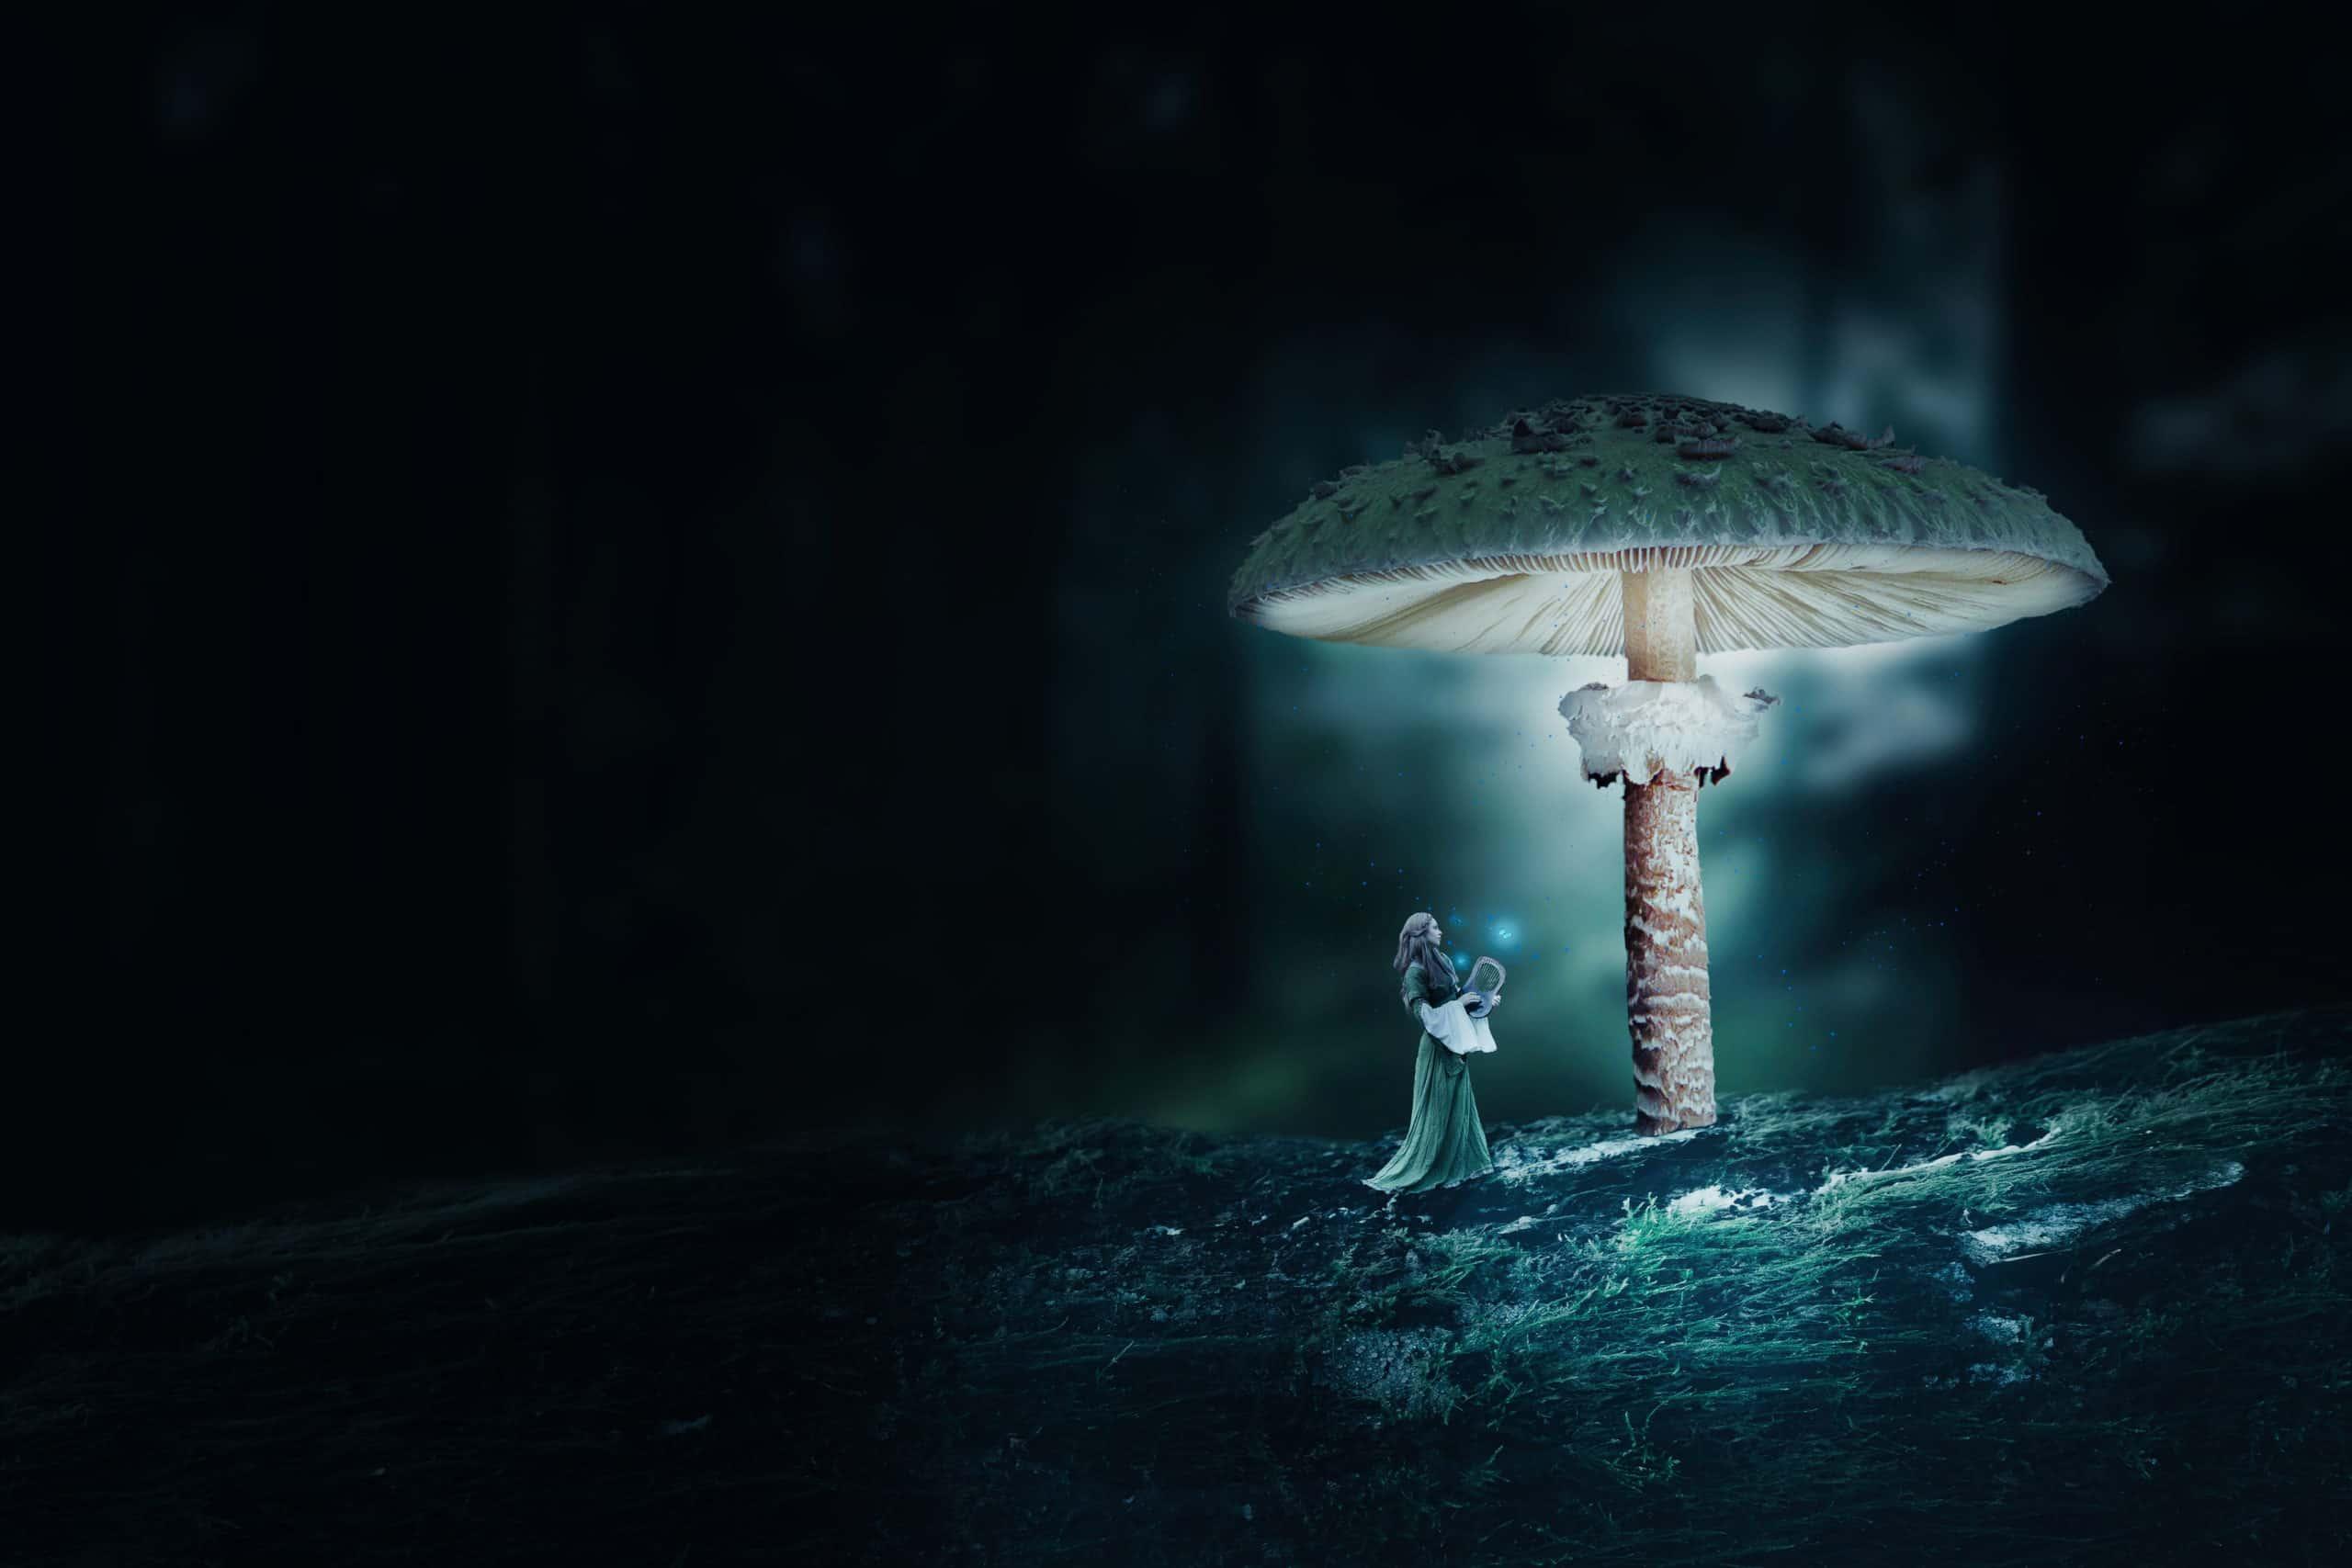 Create a Surreal Mushroom Forest Night Scene in Photoshop